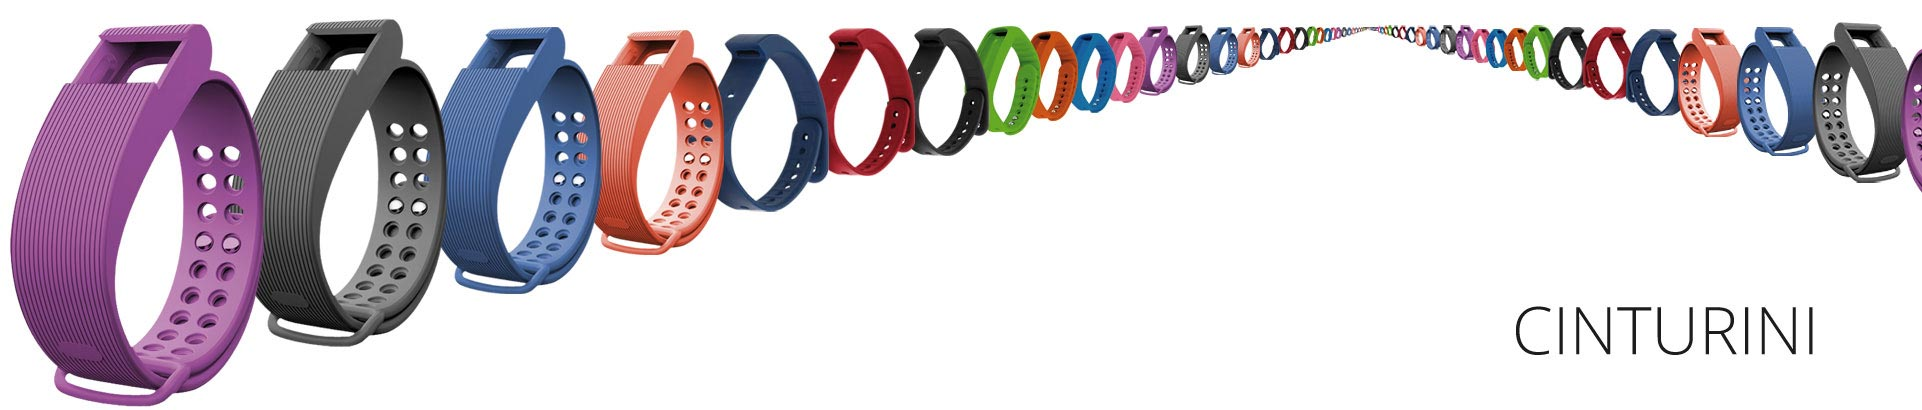 Cinturini KYCB0005-7